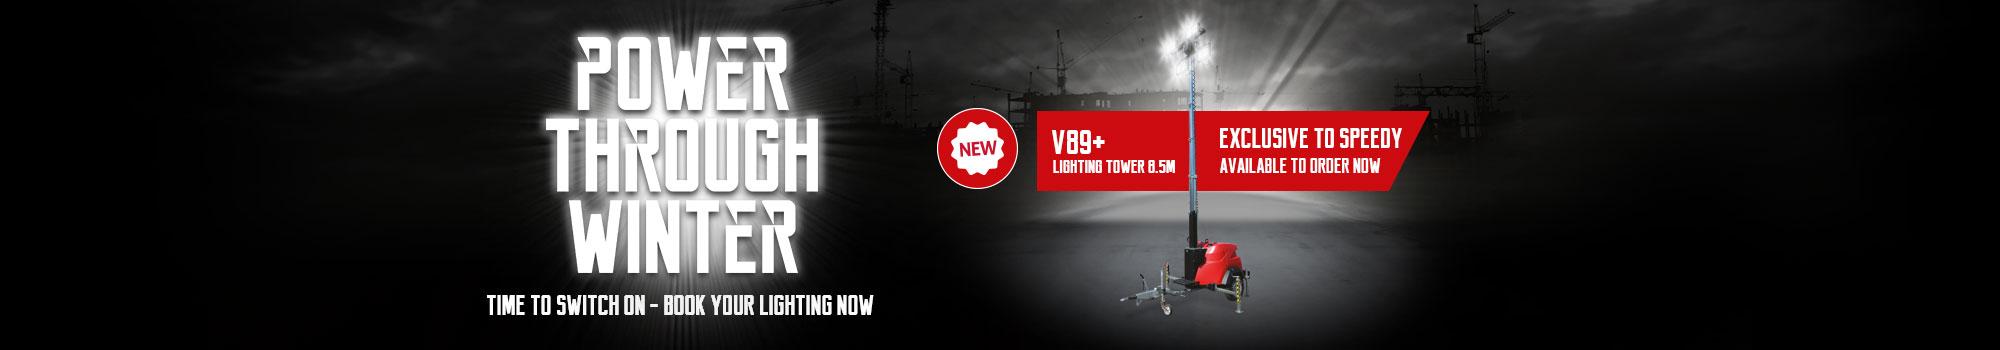 PTW-Banner-2B-Landing-Page-Banner-VB9.jpg